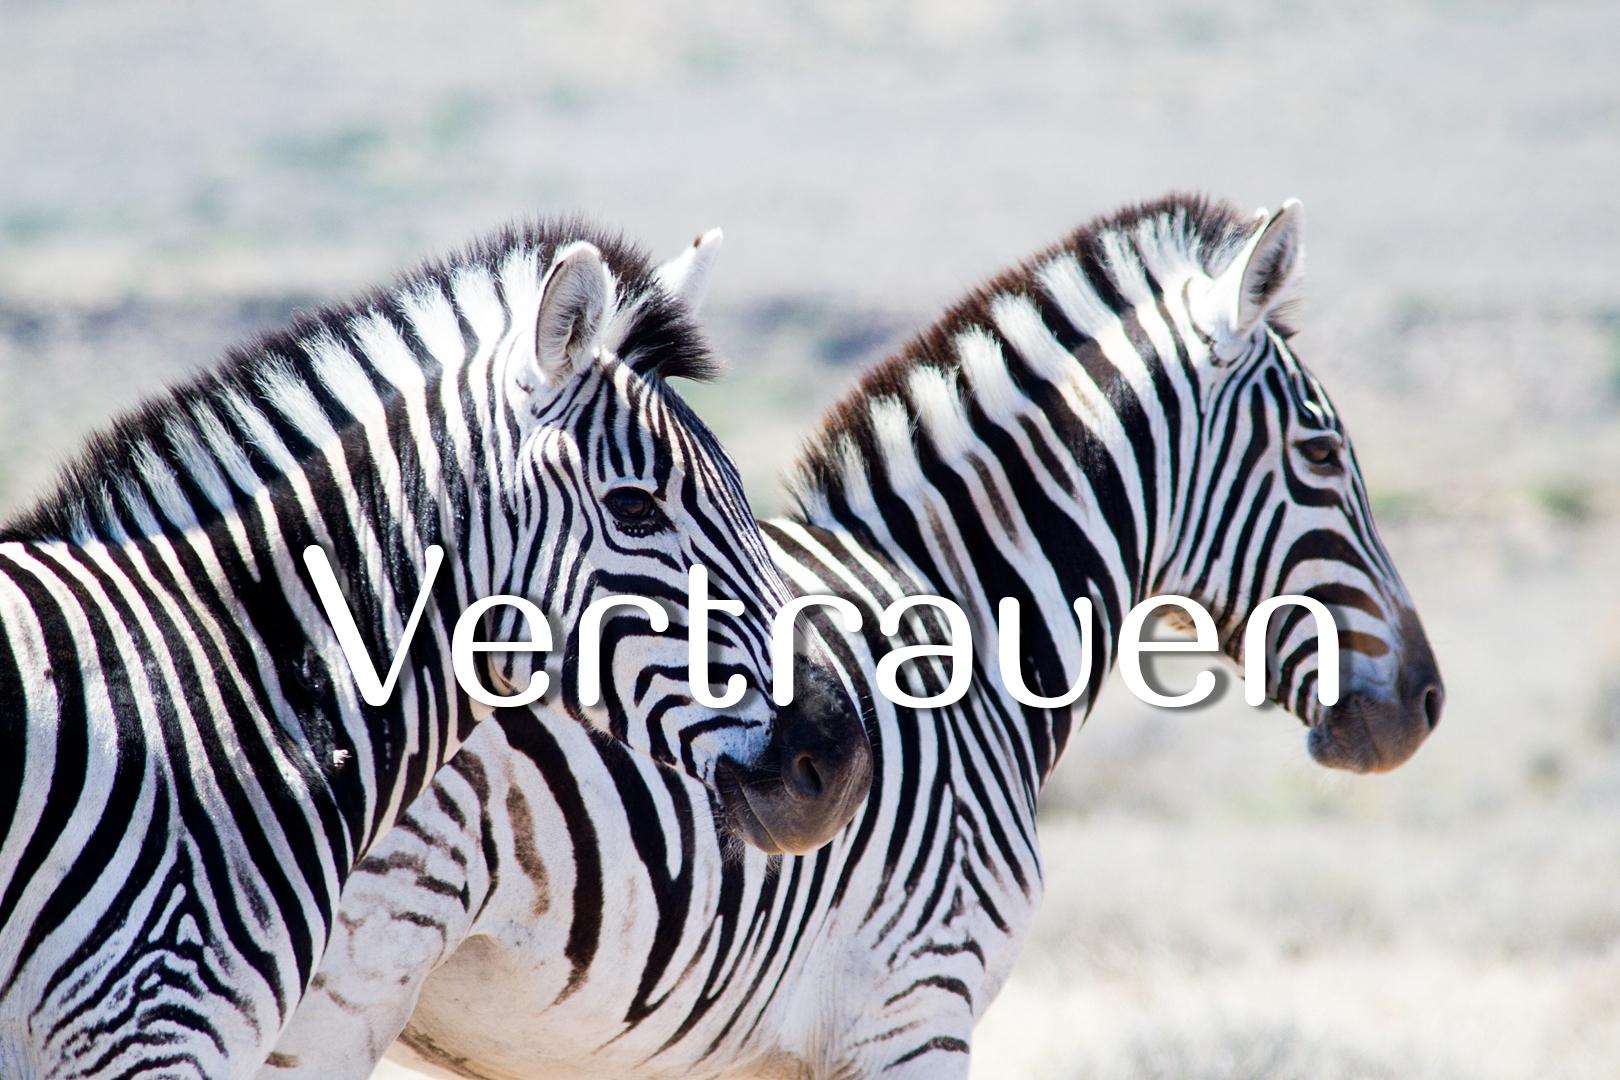 Zebras_7545_Vertrauen